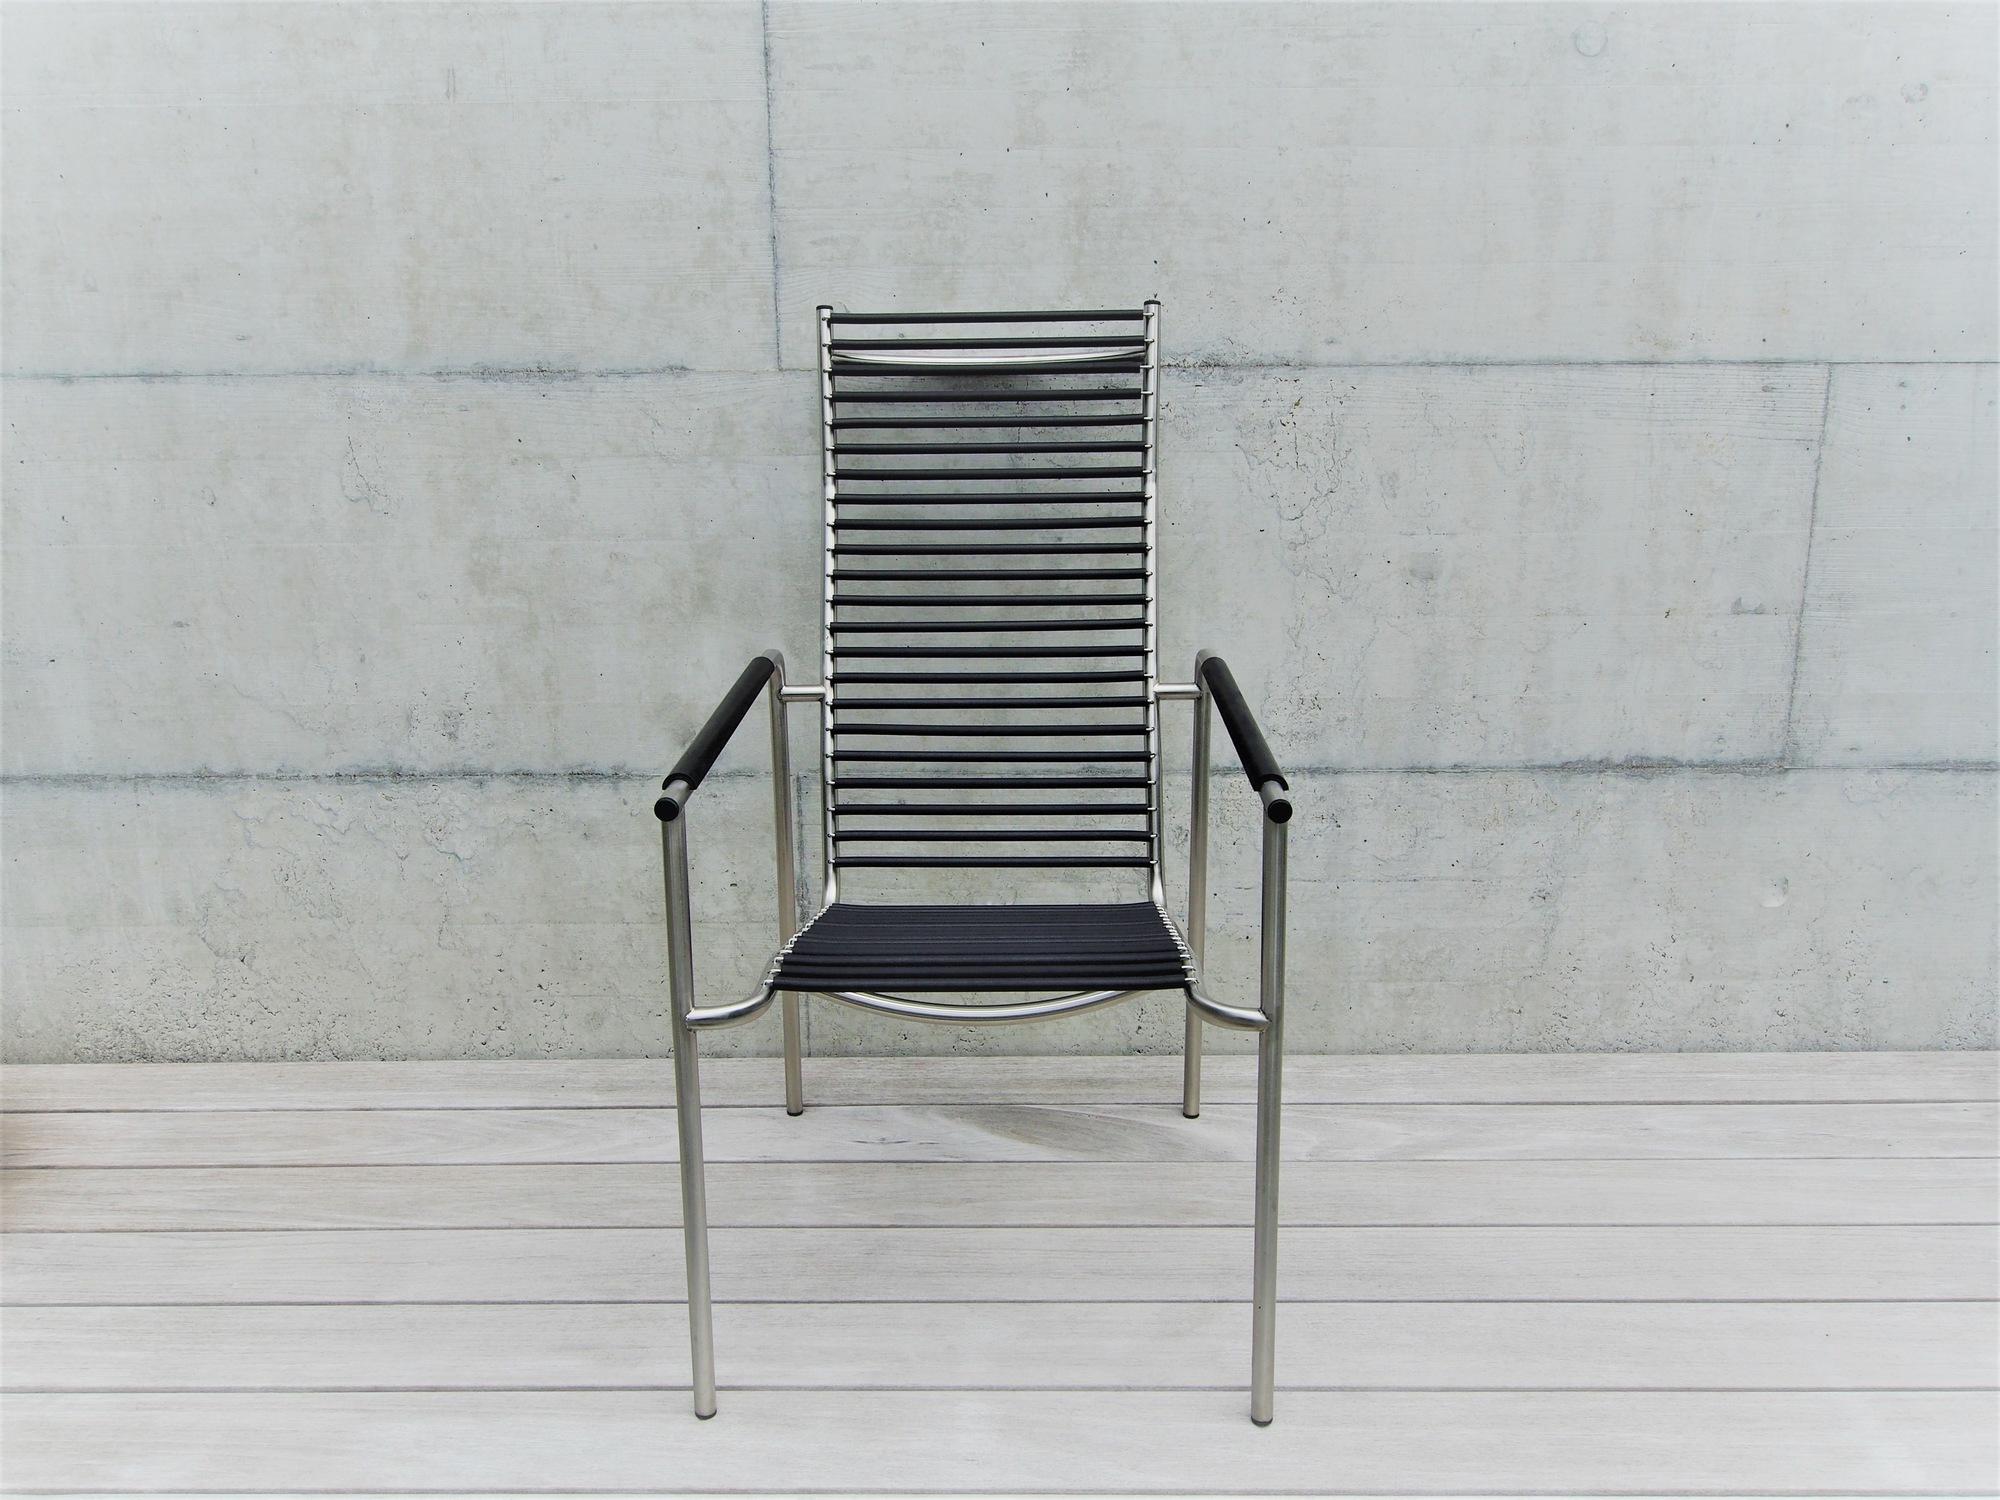 1531834168-gartenmoebel-clone-fauteuil-julia_0.jpg